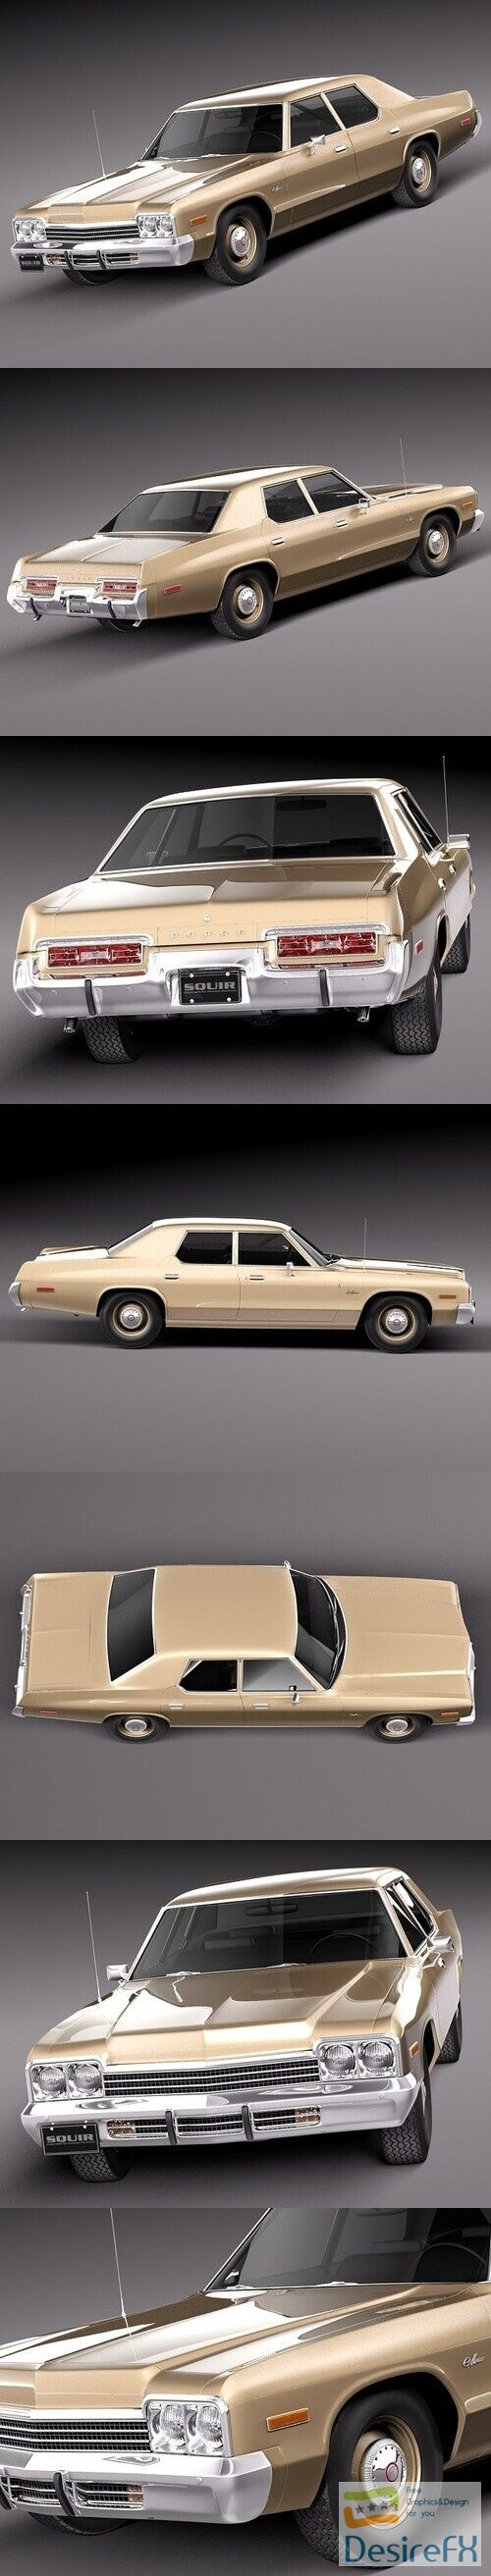 Dodge Monaco 1974 3D Model